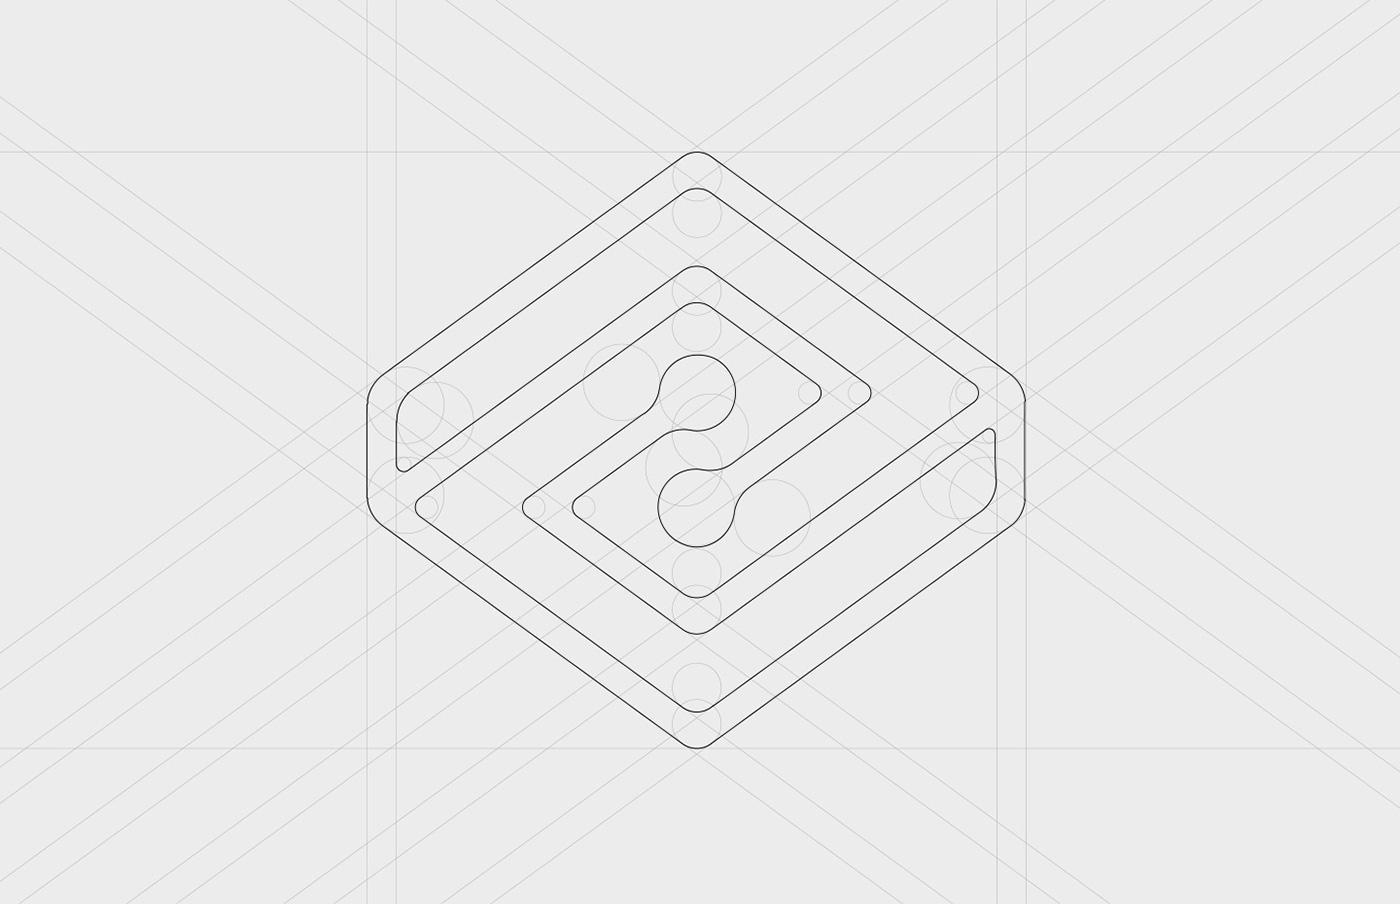 doloop u2122 brand identity design on behance